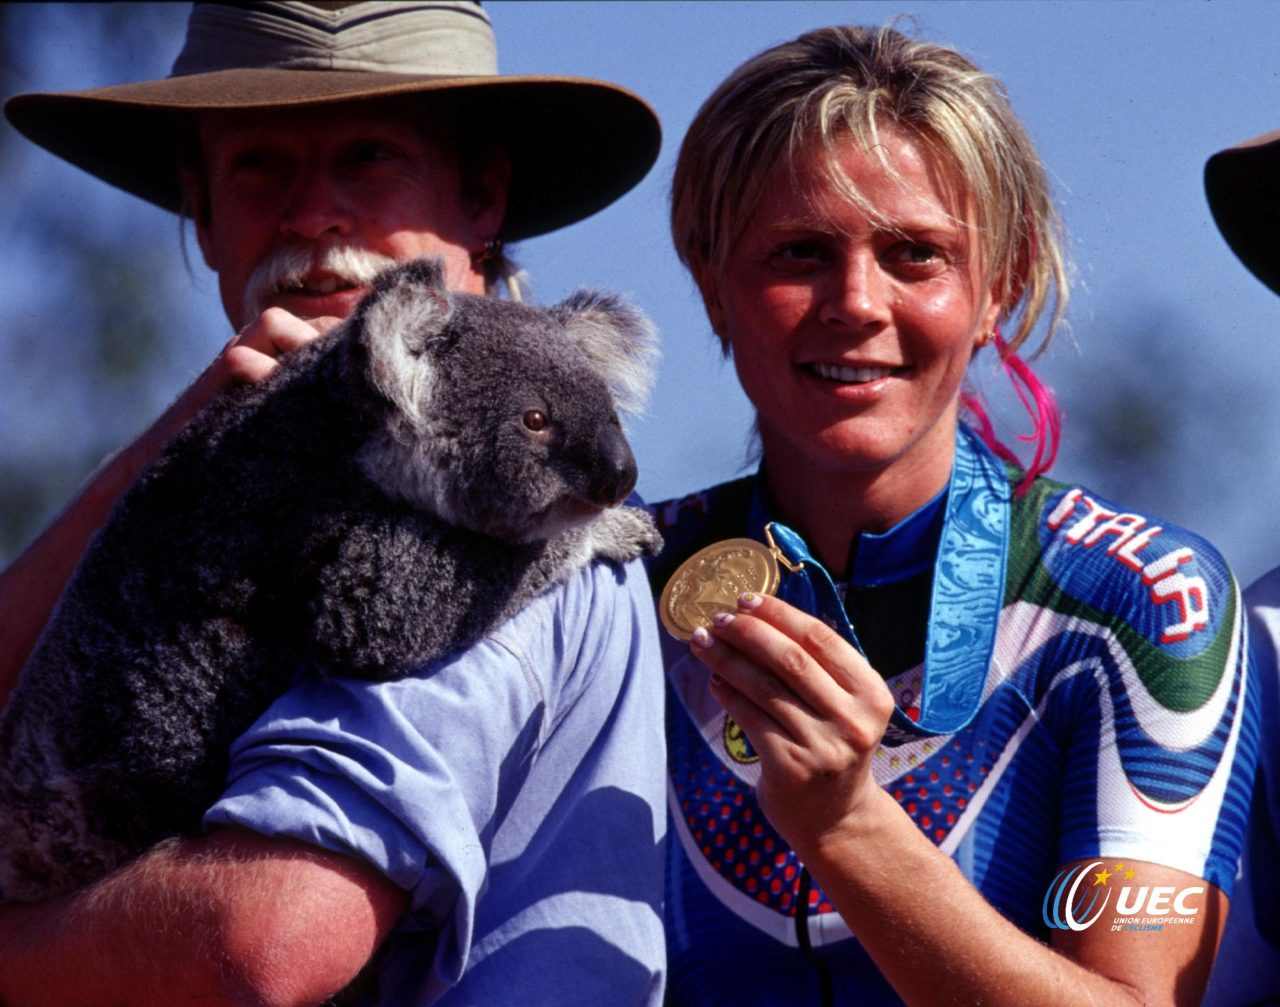 Paola Pezzo Mountain Bike Olympic Games Sydney